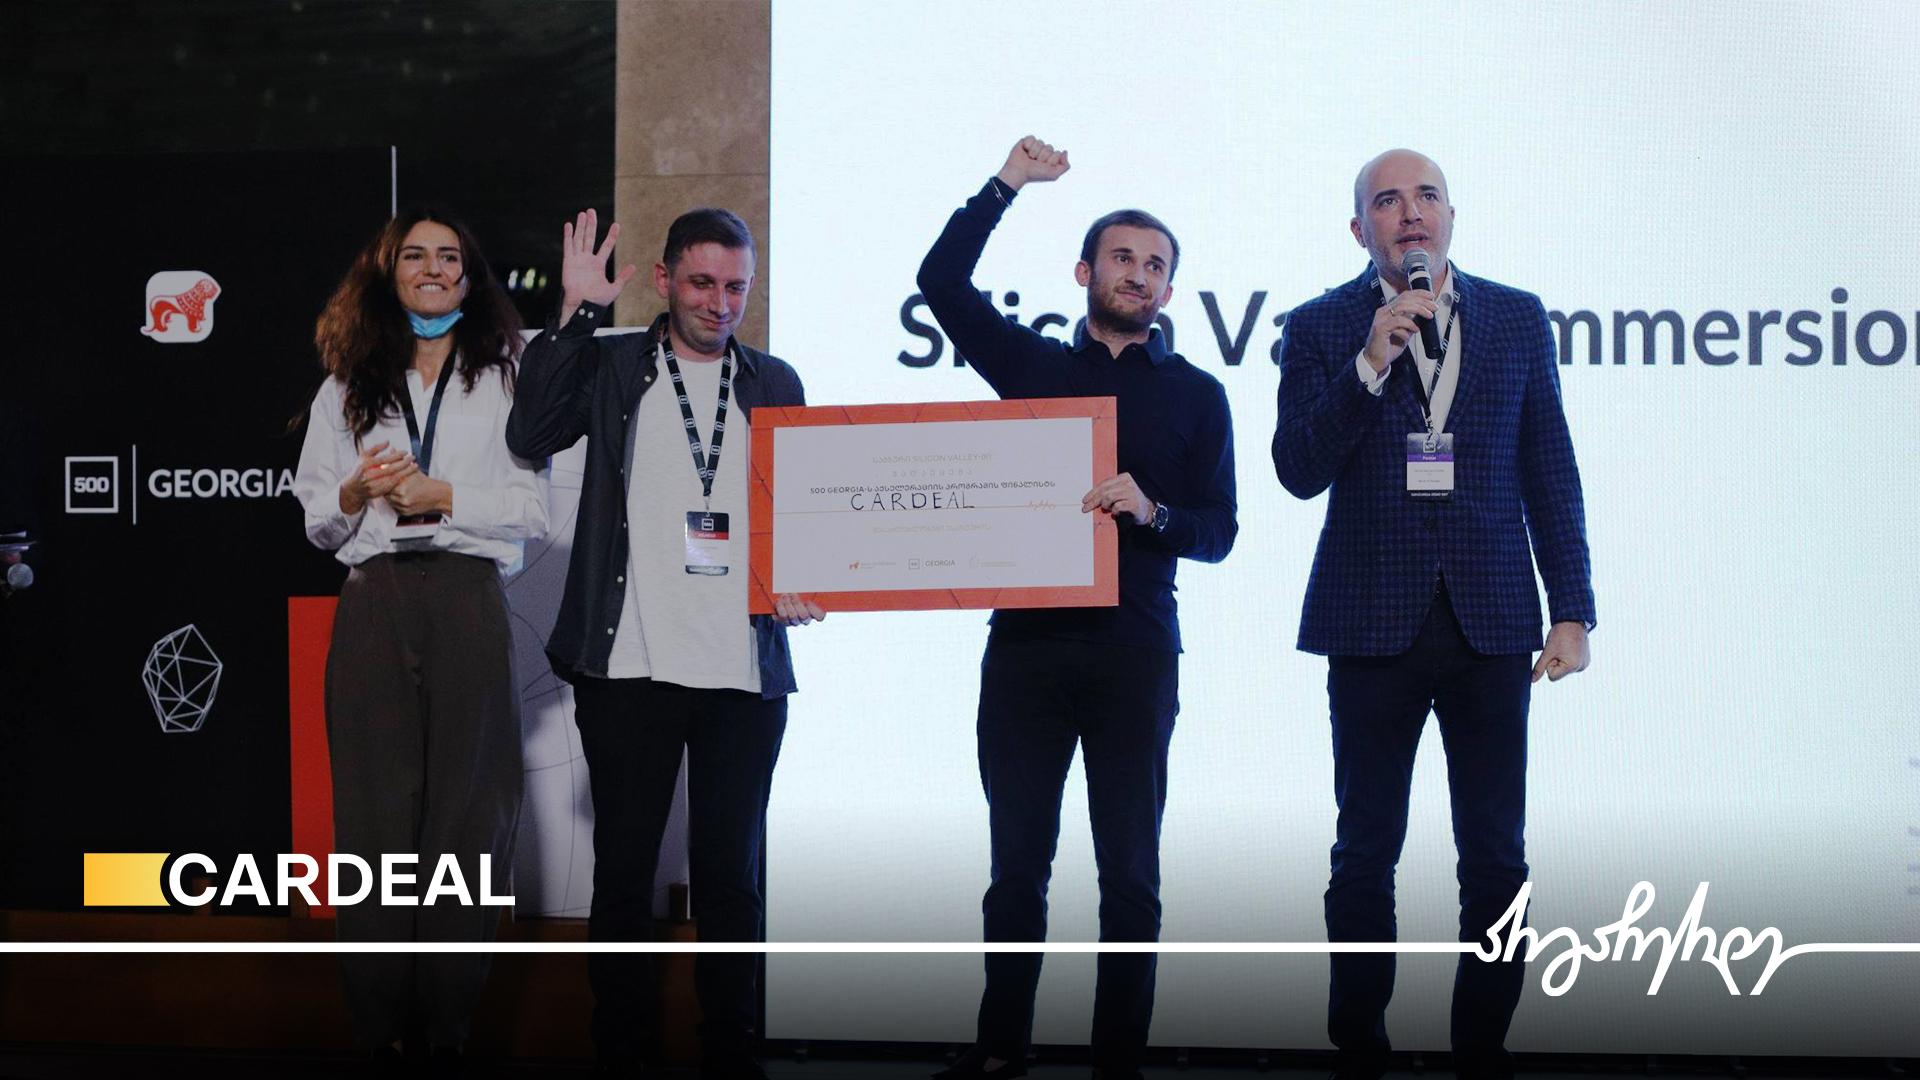 500 Startups – მა, საქართველოს ბანკმა და საქართველოს ინოვაციების და ტექნოლოგიების სააგენტომ პროგრამის დემო დღეს უმასპინძლეს